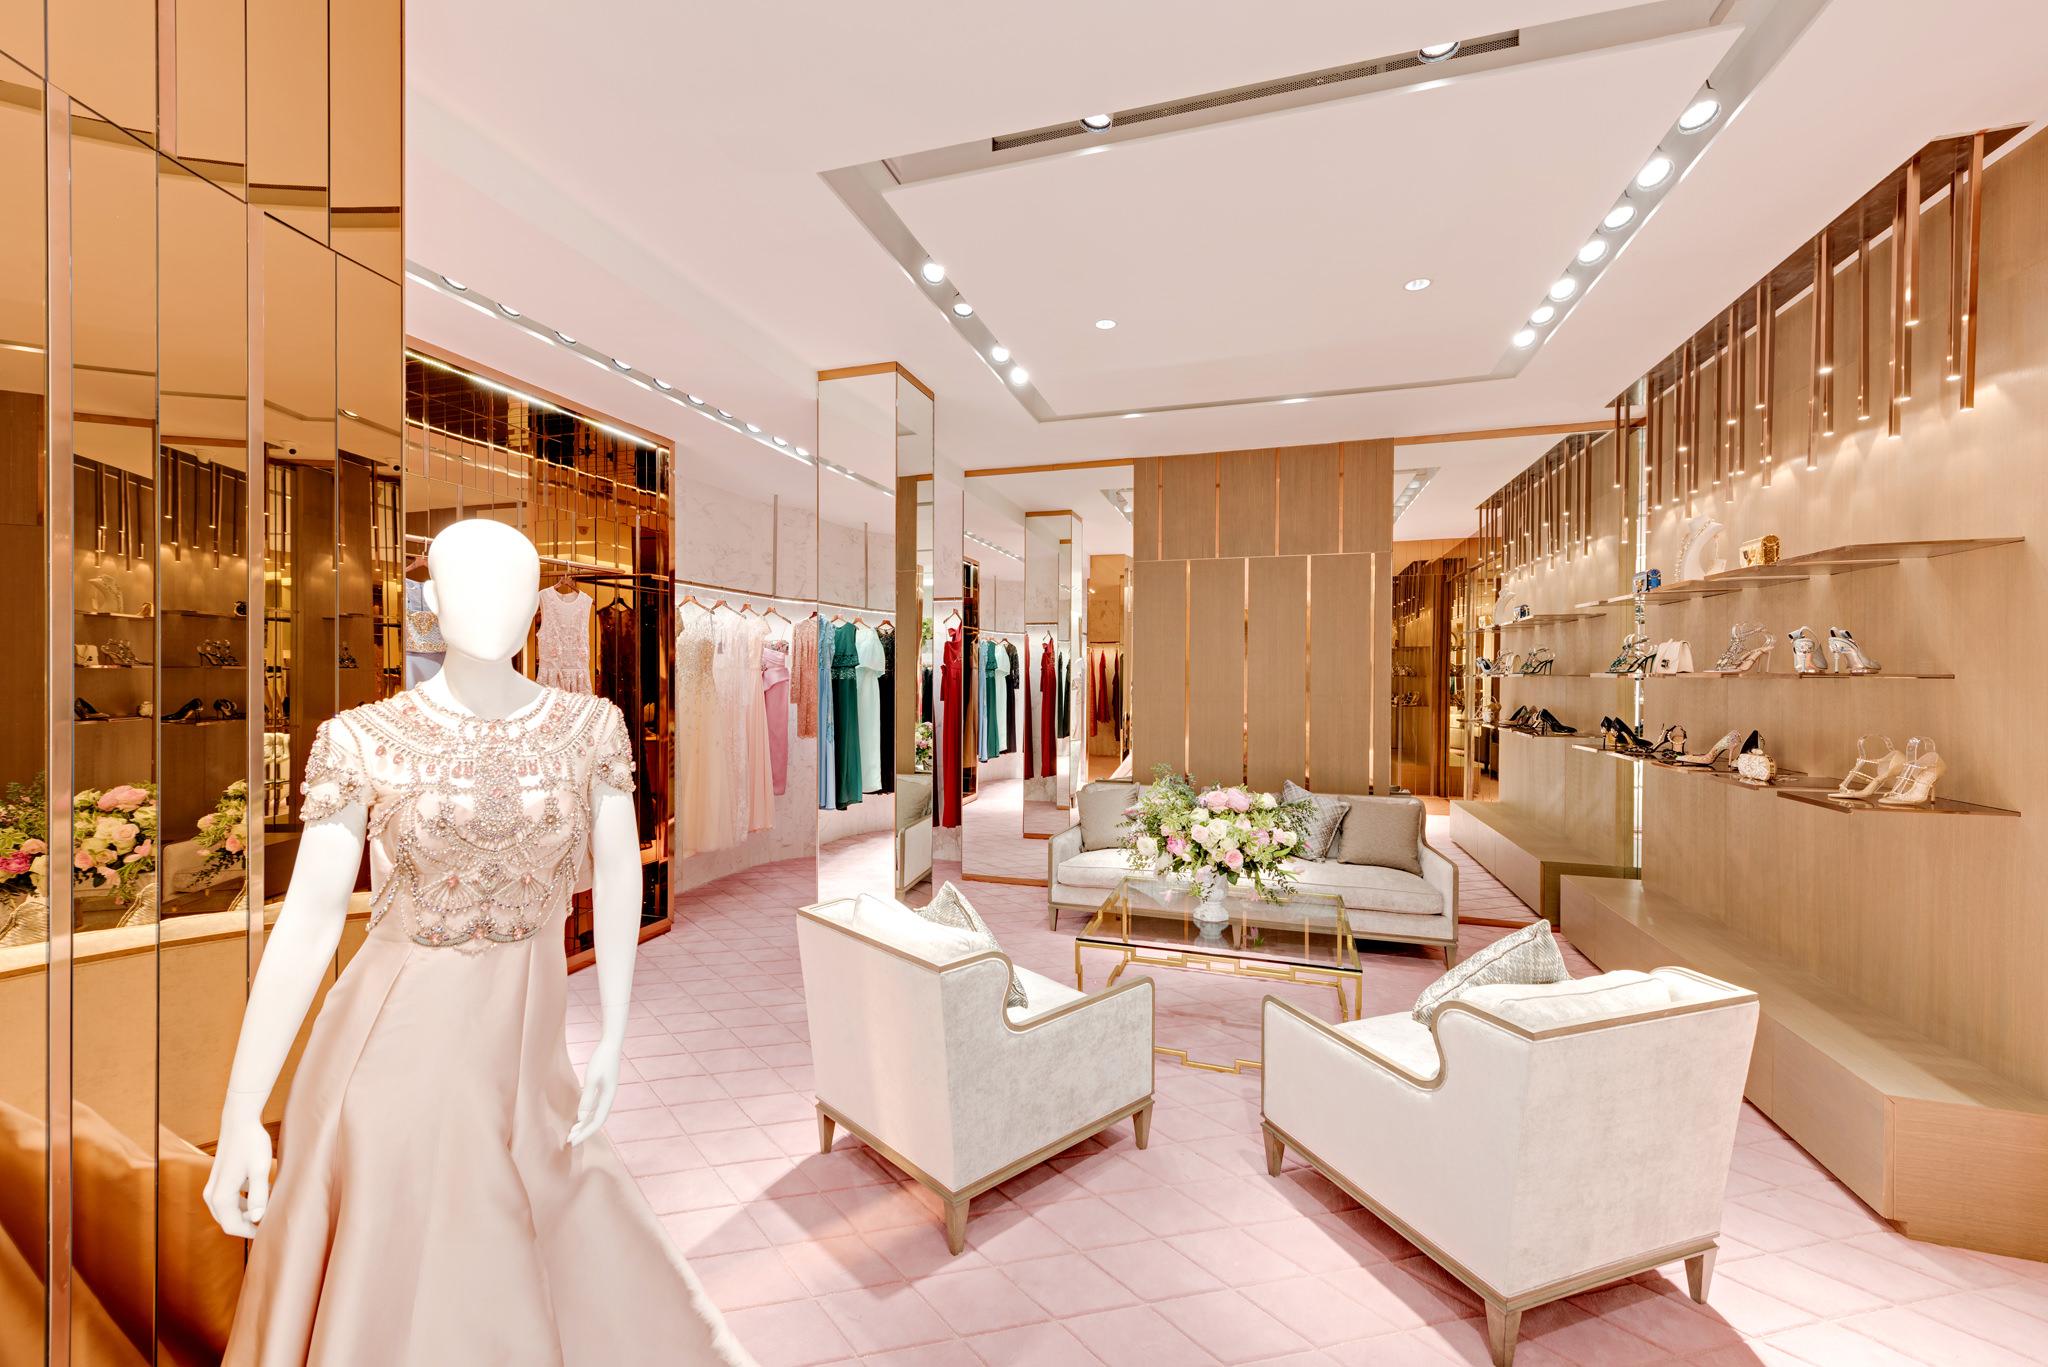 20161224 - Jacqueline - HCM - Commercial - Interior - Store - Retouch 0006.jpg